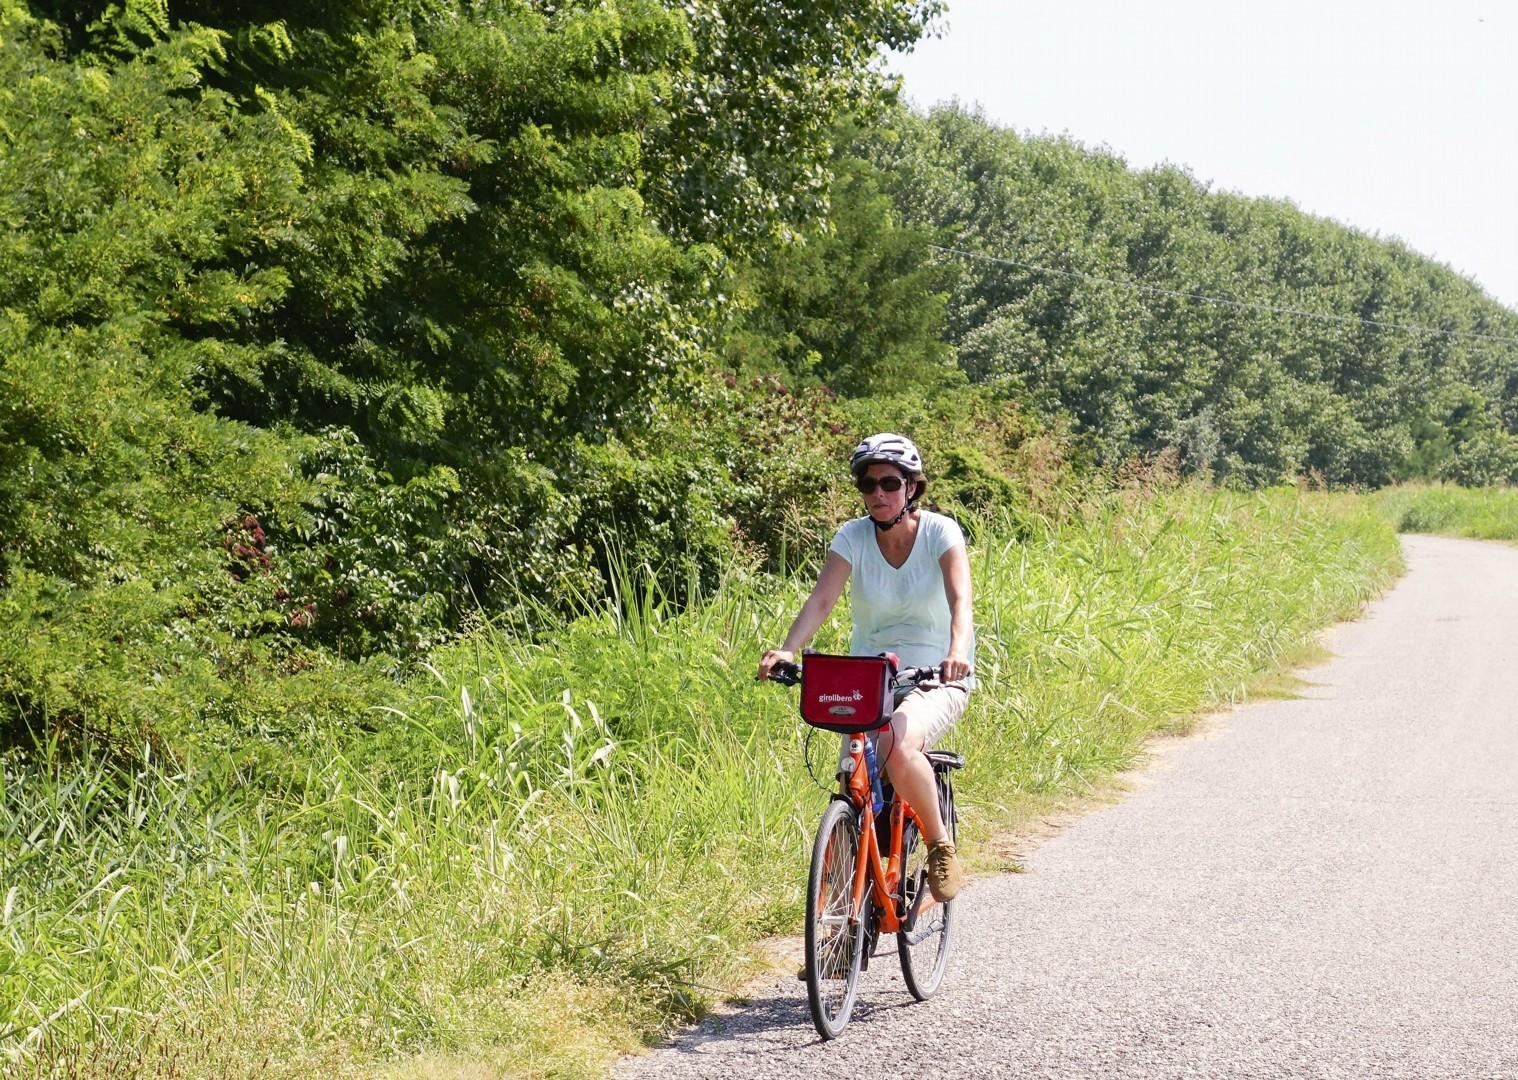 waterwaysofvenice15.jpg - Italy - Venetian Waterways (Mantova to Venice) - Bike and Barge Holiday - Leisure Cycling